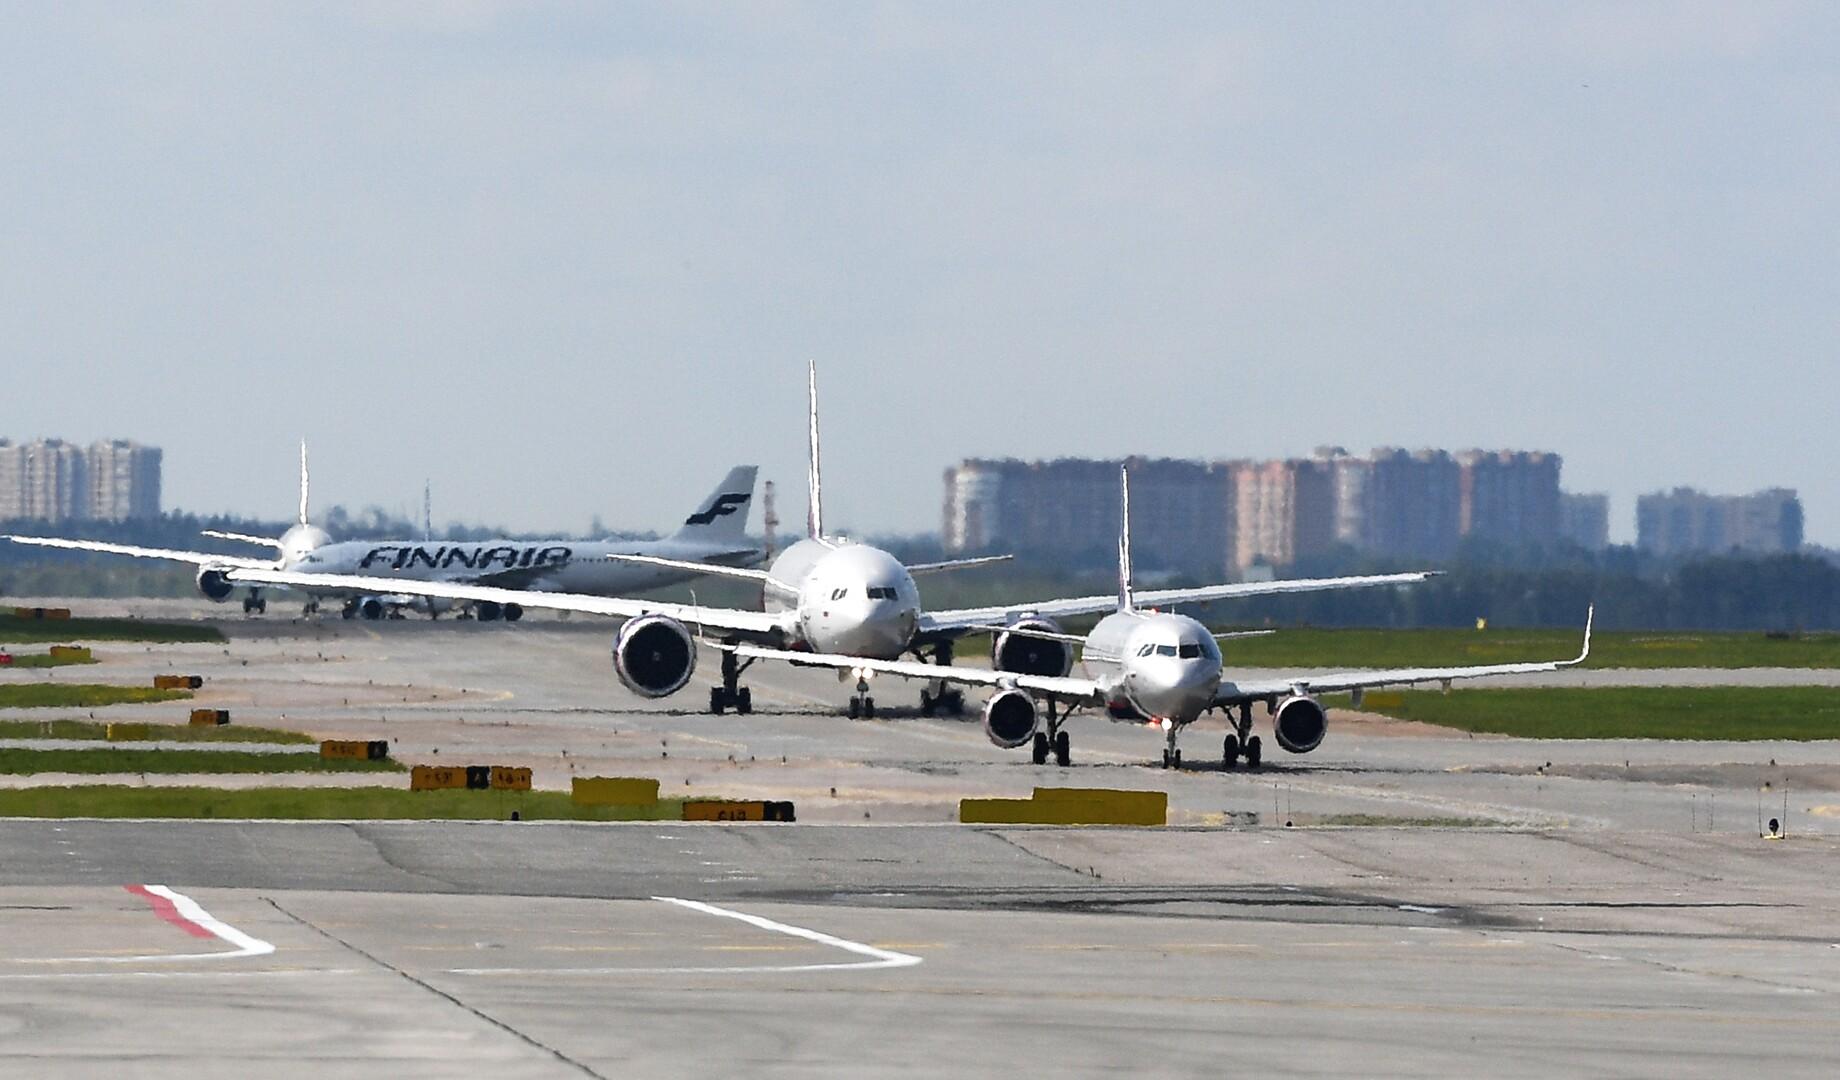 اصطدام طائرتين في مطار شيريميتيفو بضواحي موسكو